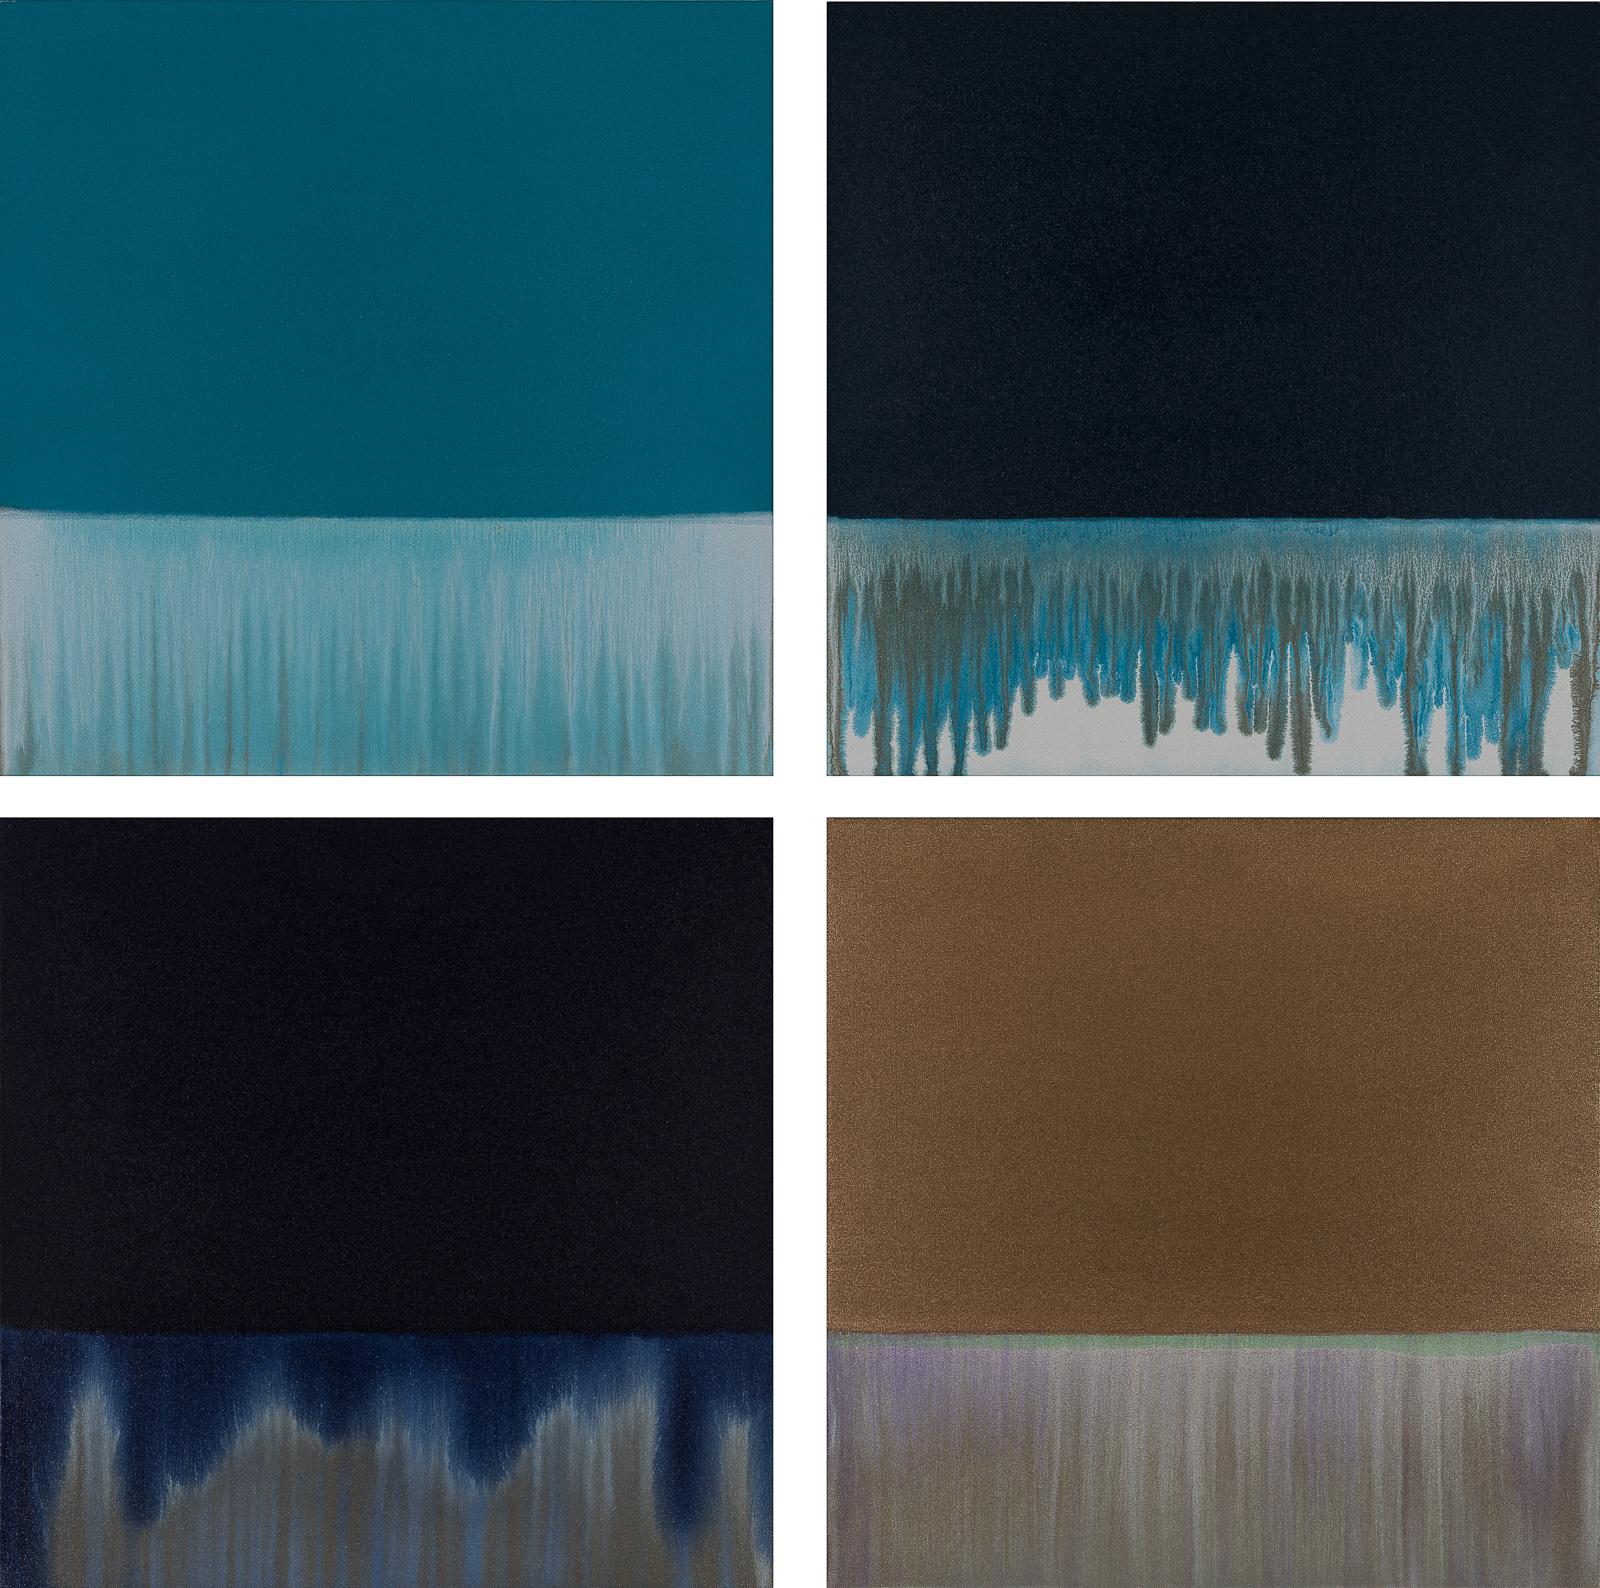 "Gradient Flow: Teal, Pthalo, Indigo & Bronze, 2018, acrylic on unprimed canvas, 24"" x 24"" each panel"